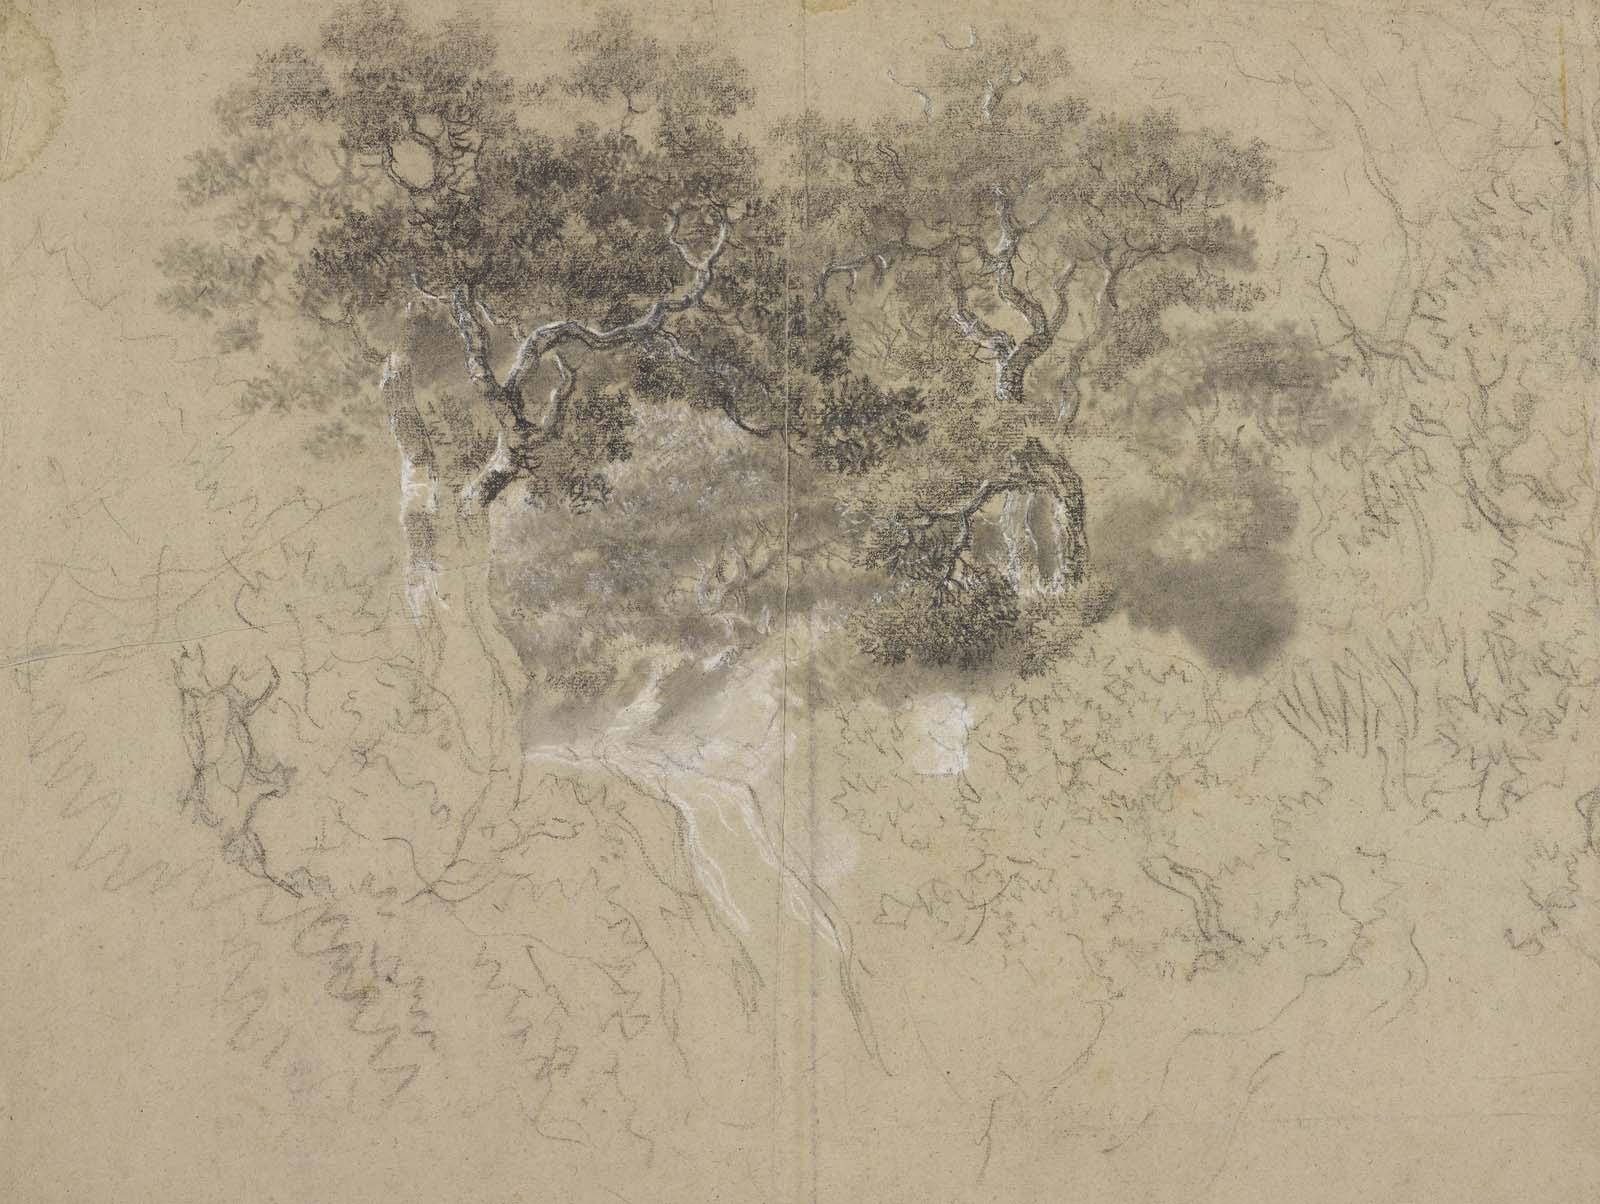 a pencil sketch of tree foliage